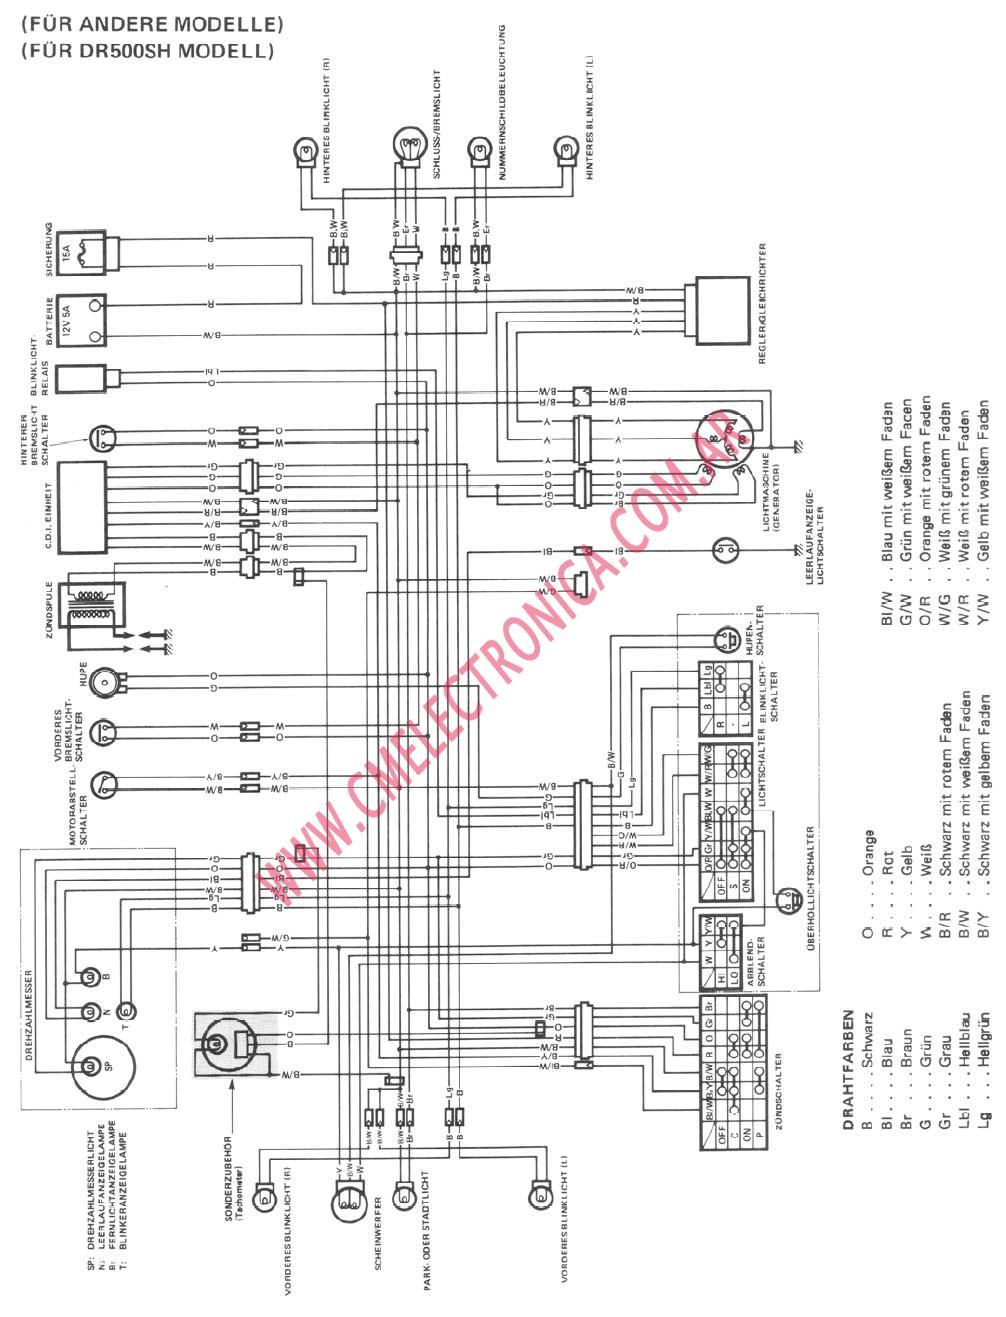 Diagram 2007 Gsxr 600 Wiring code p1684 er diagram for travel agency